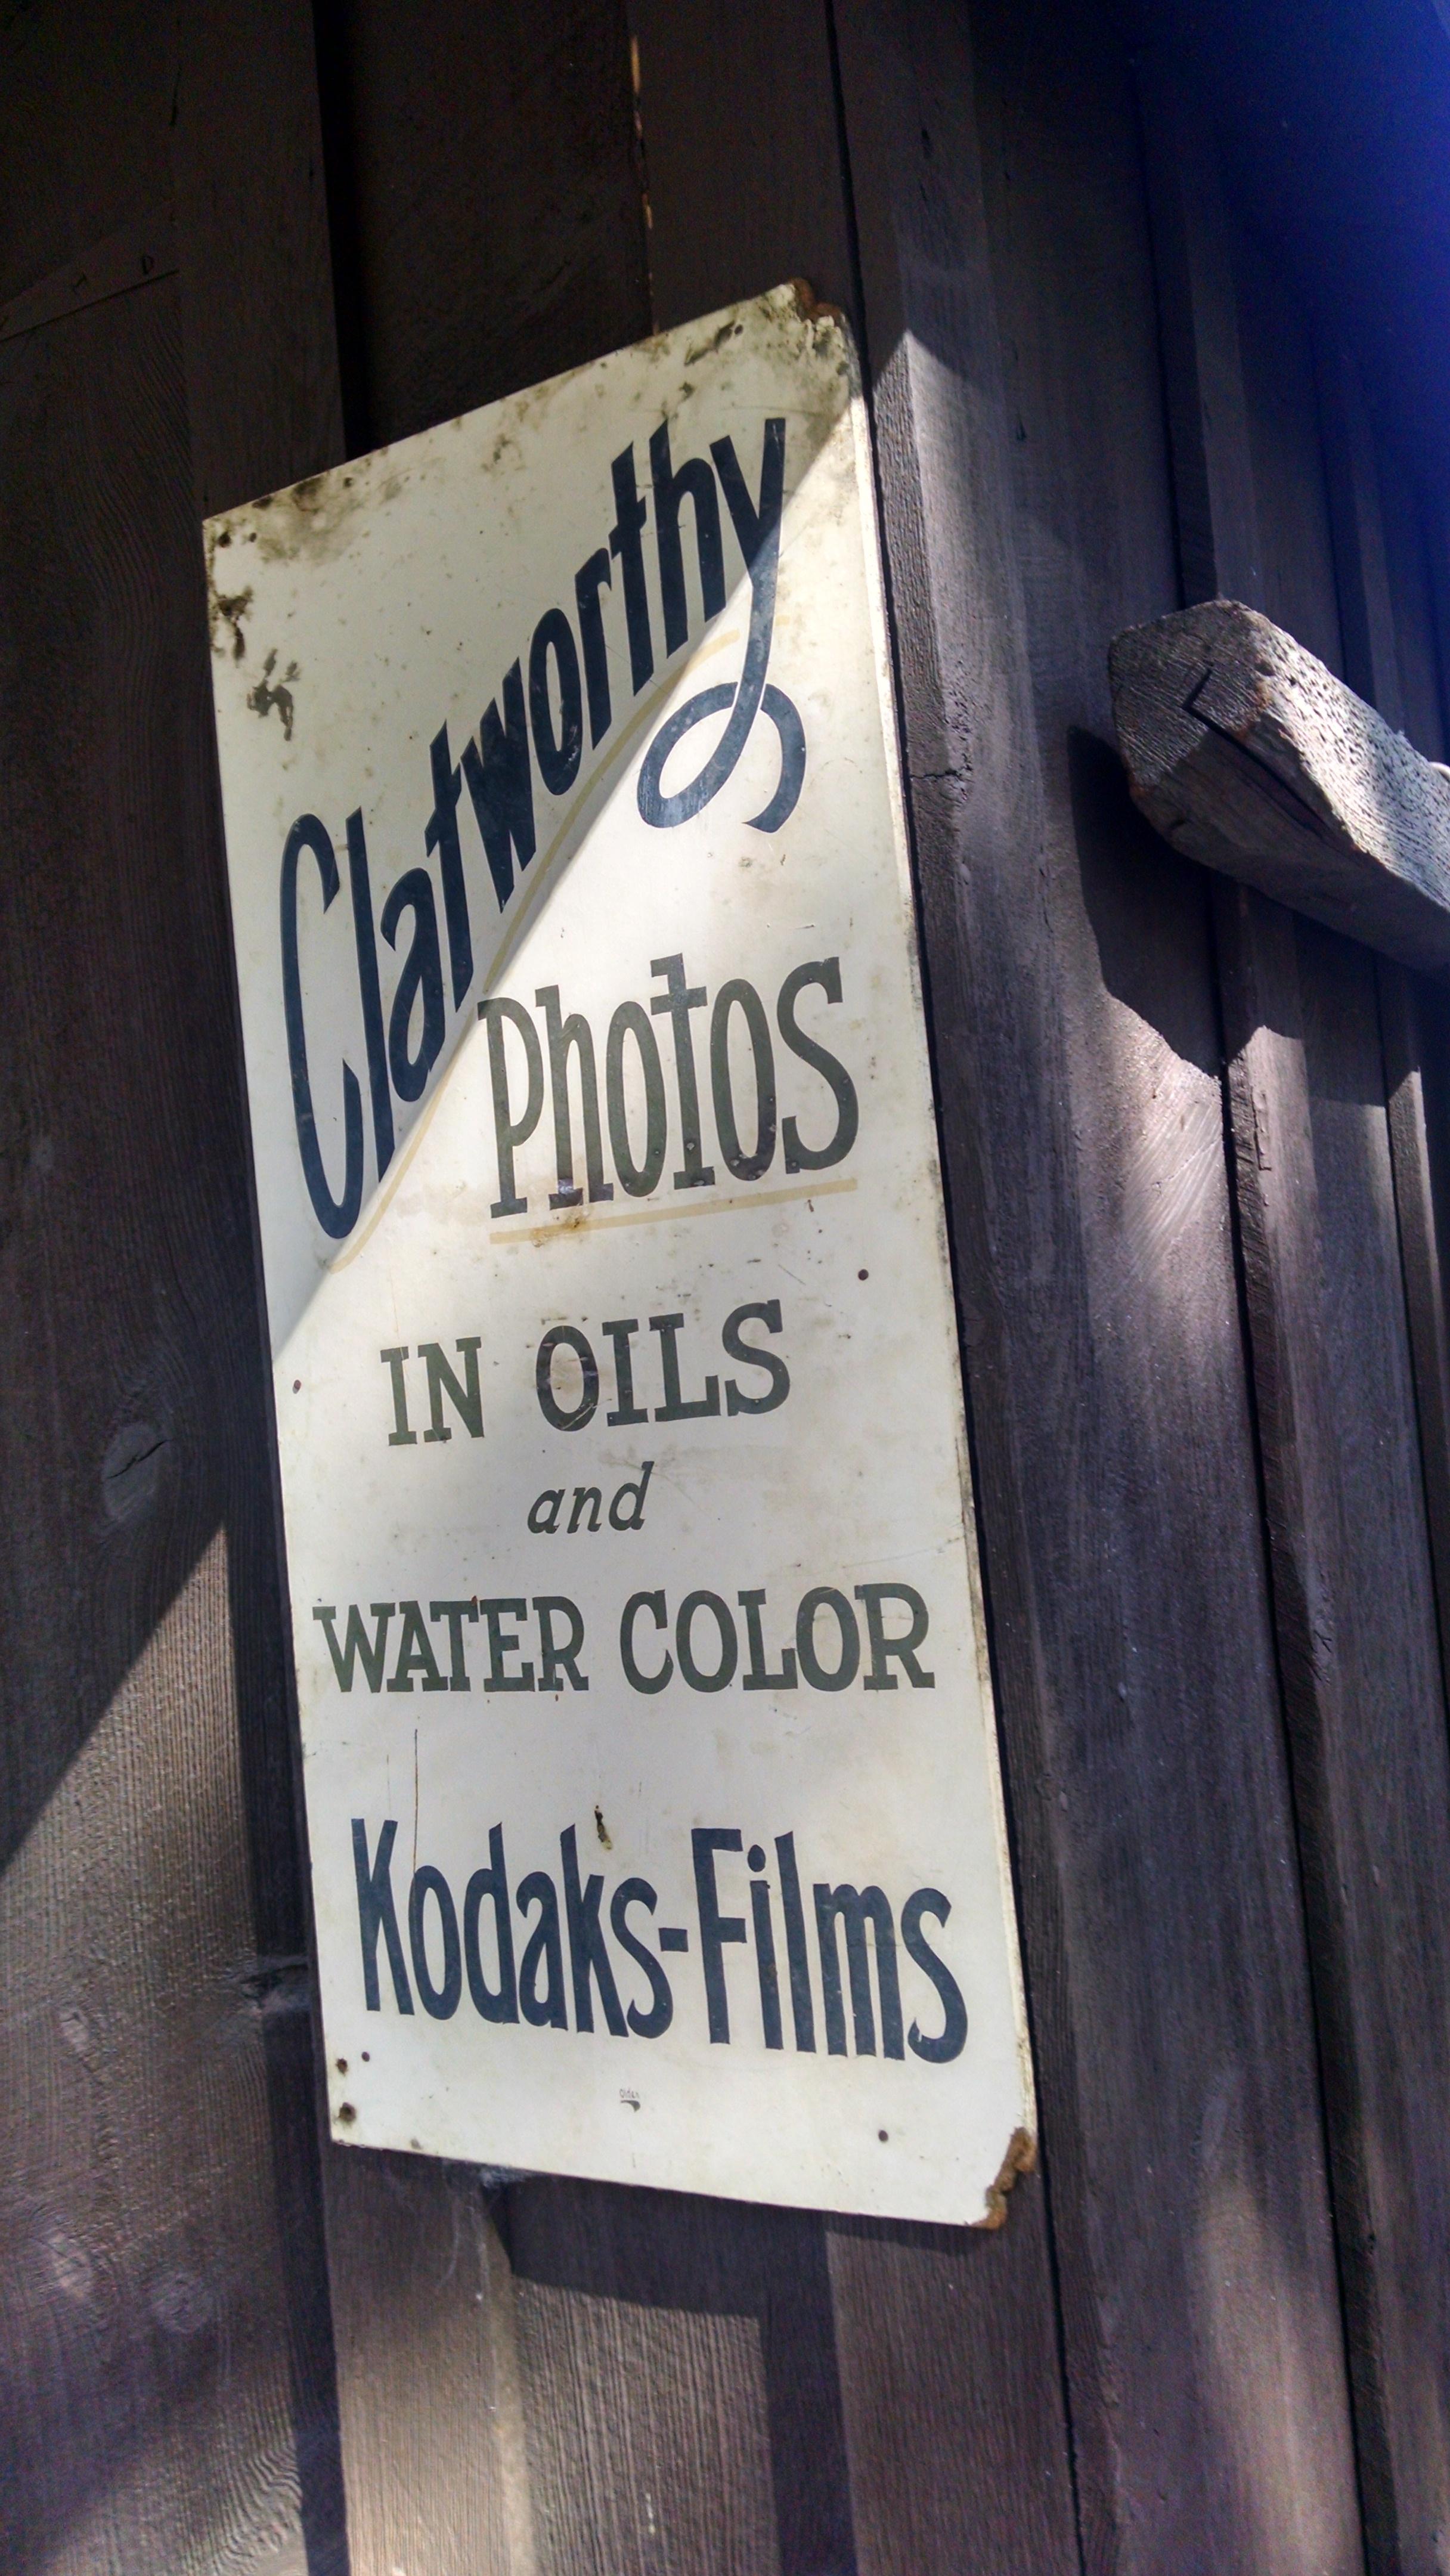 Clatworthy photos